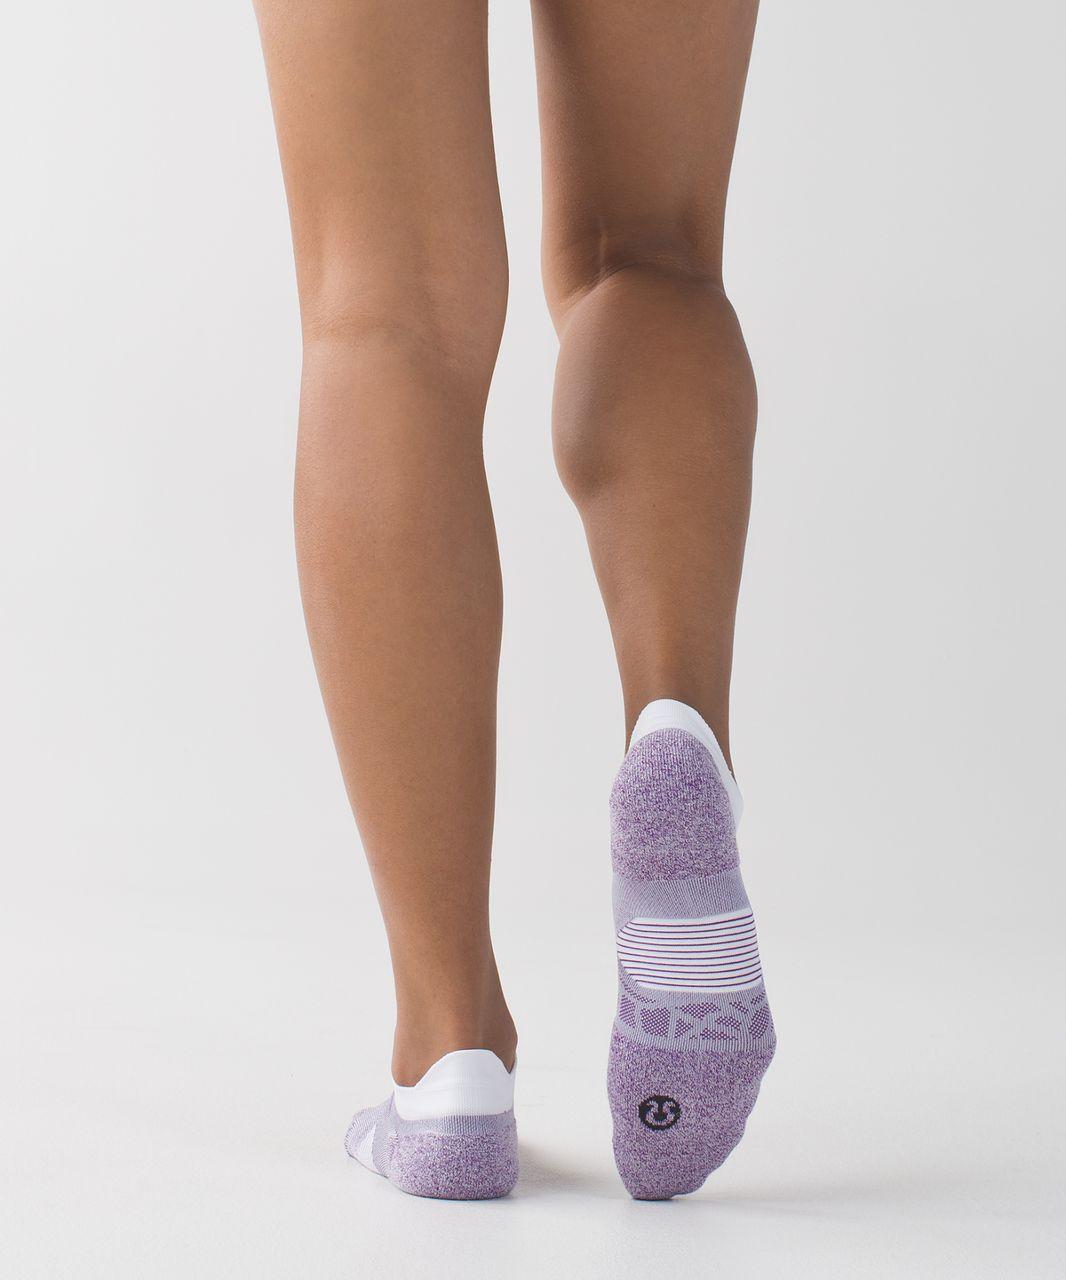 Lululemon Speed Sock *Silver - Tender Violet / Cool Breeze